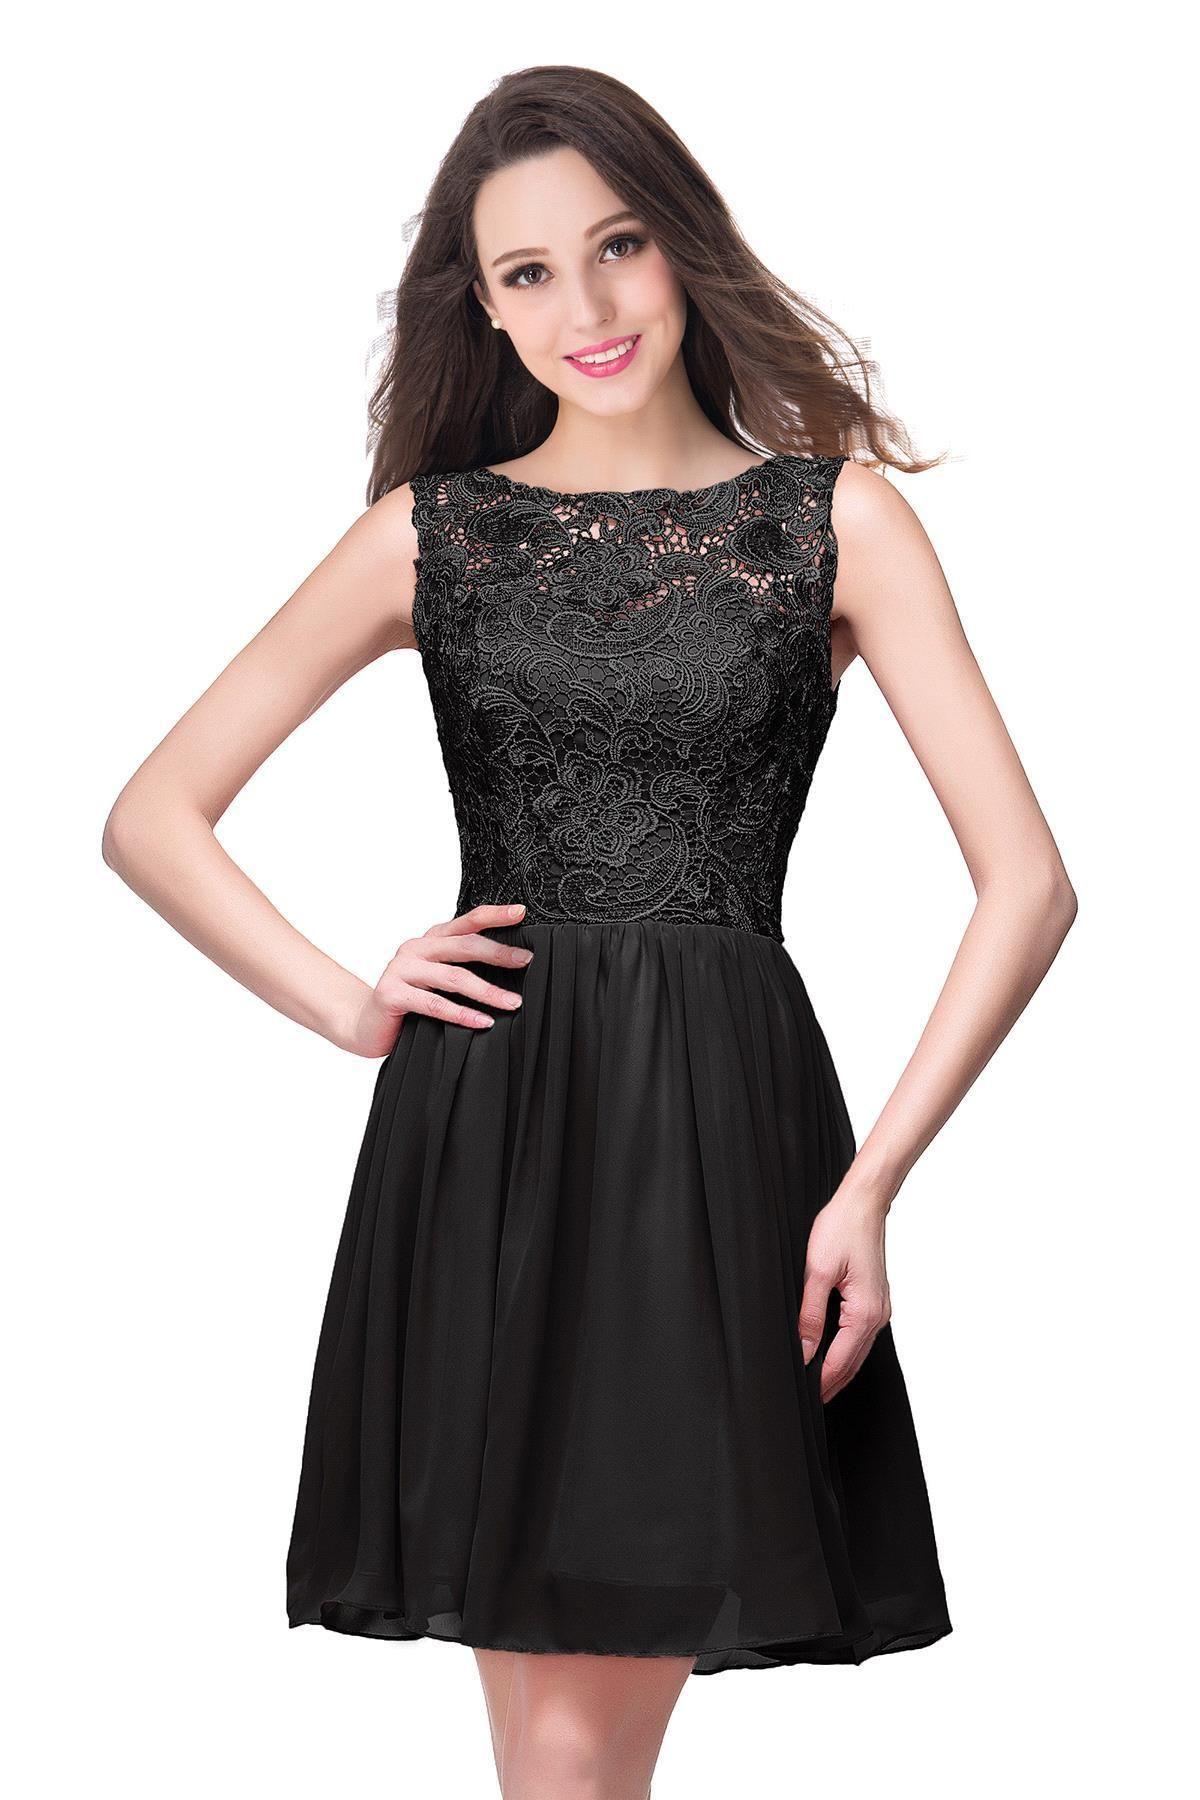 2020 Cheap Lavender A Line Chiffon Designer Prom Dresses Lace Top Knee Length Short Evening Dresses Formal Party Gowns Bridesmaid dresses